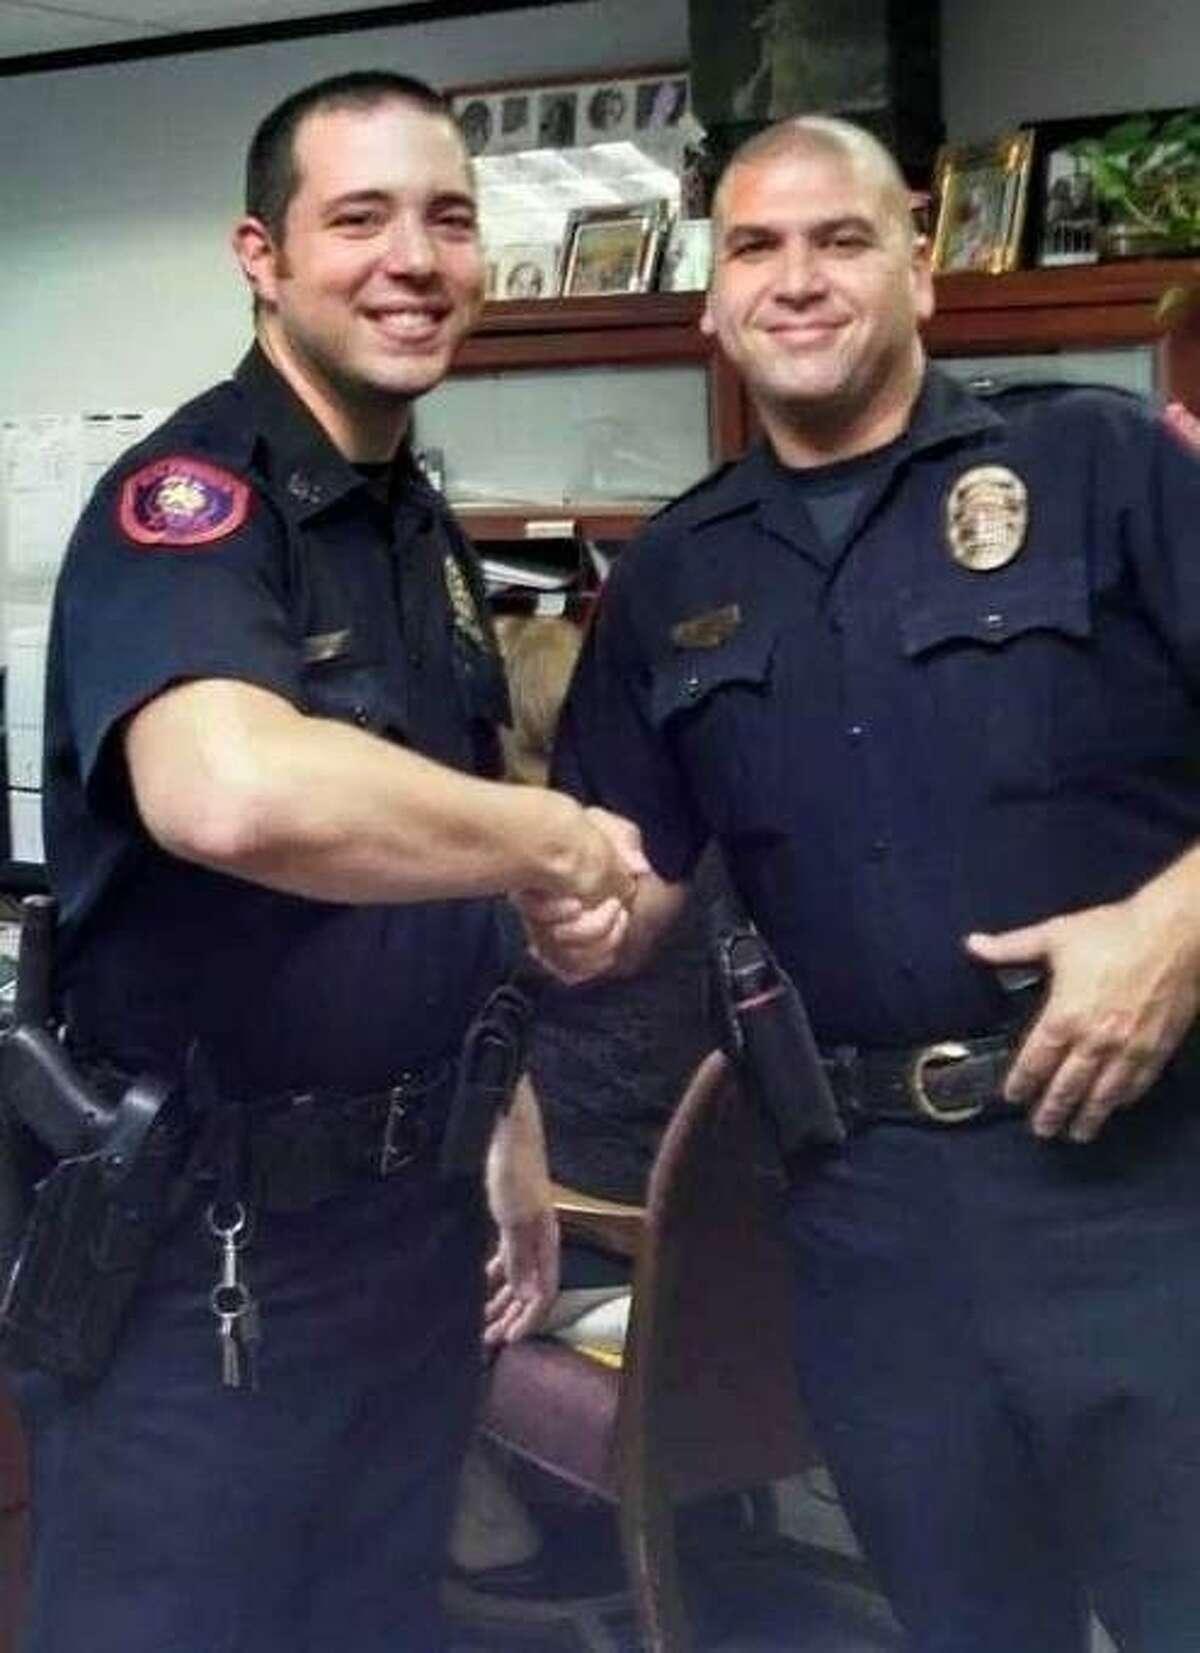 New Splendora Police Chief Christopher Wall (right) poses with Splendora PD Corporal Ryan Simpson, one of the Splendora PD team.